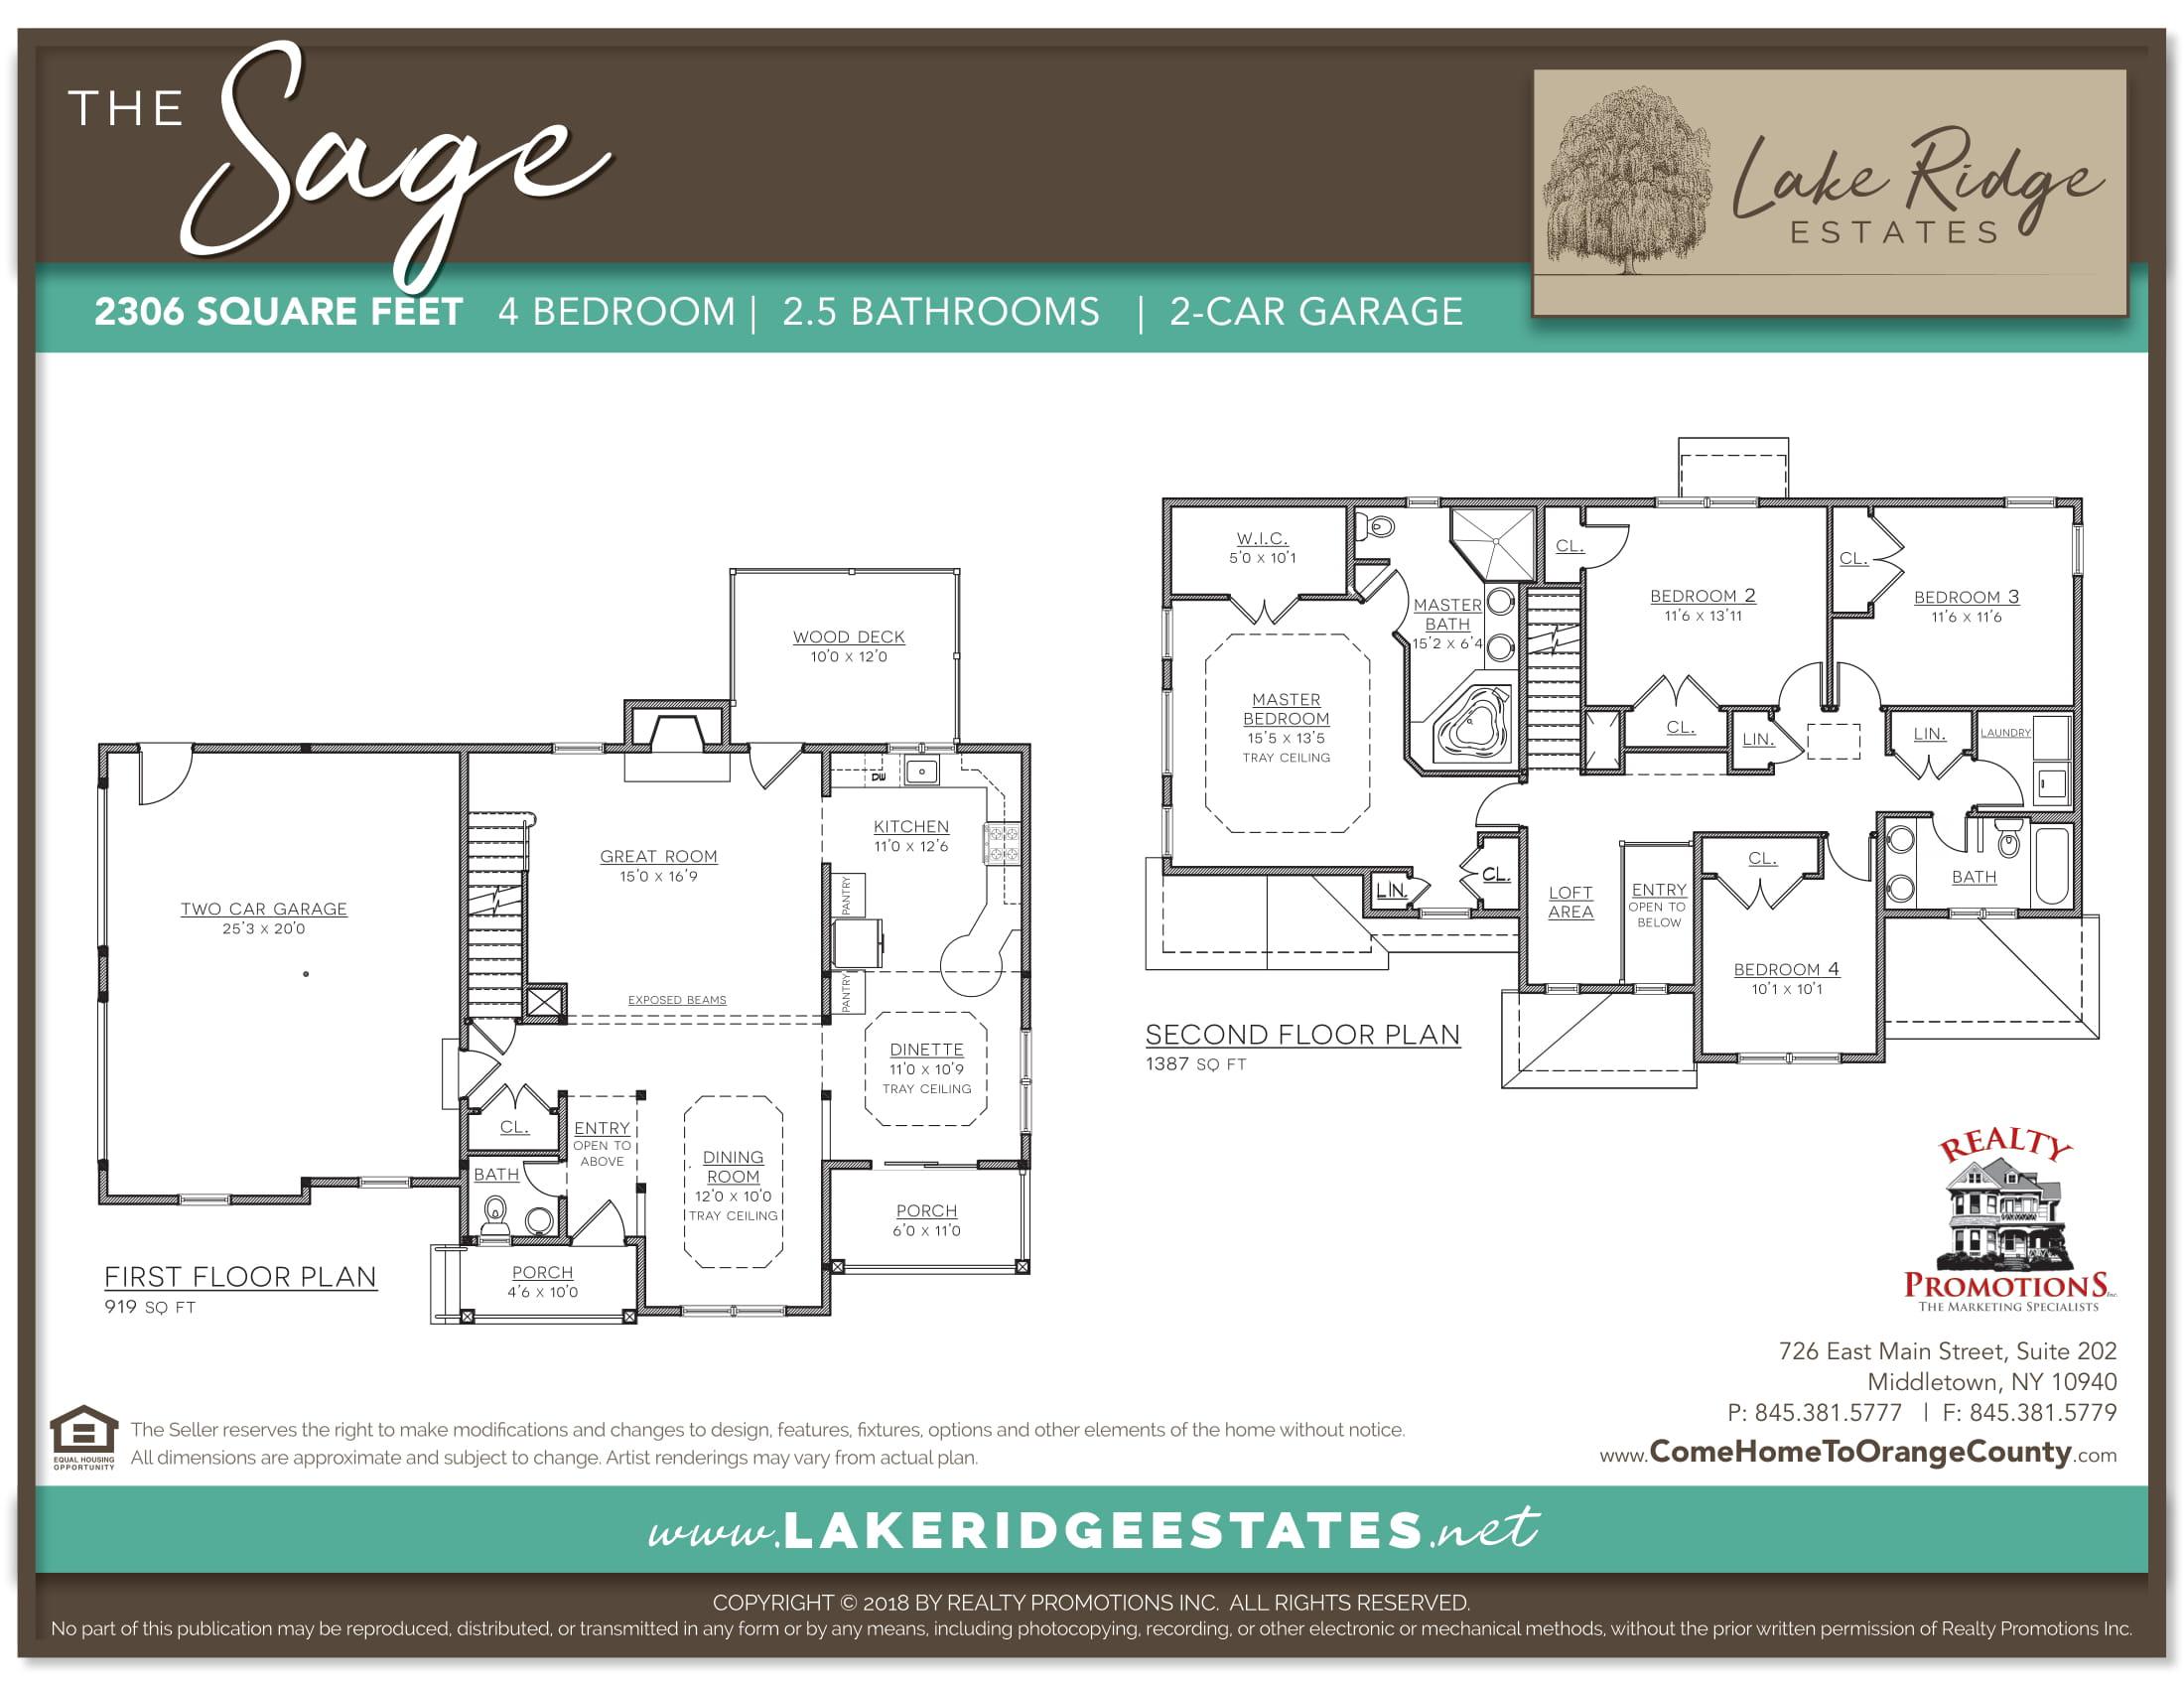 Christopher Ogden Middletown Ny Real Estate Thesage Lakeridge 1 2